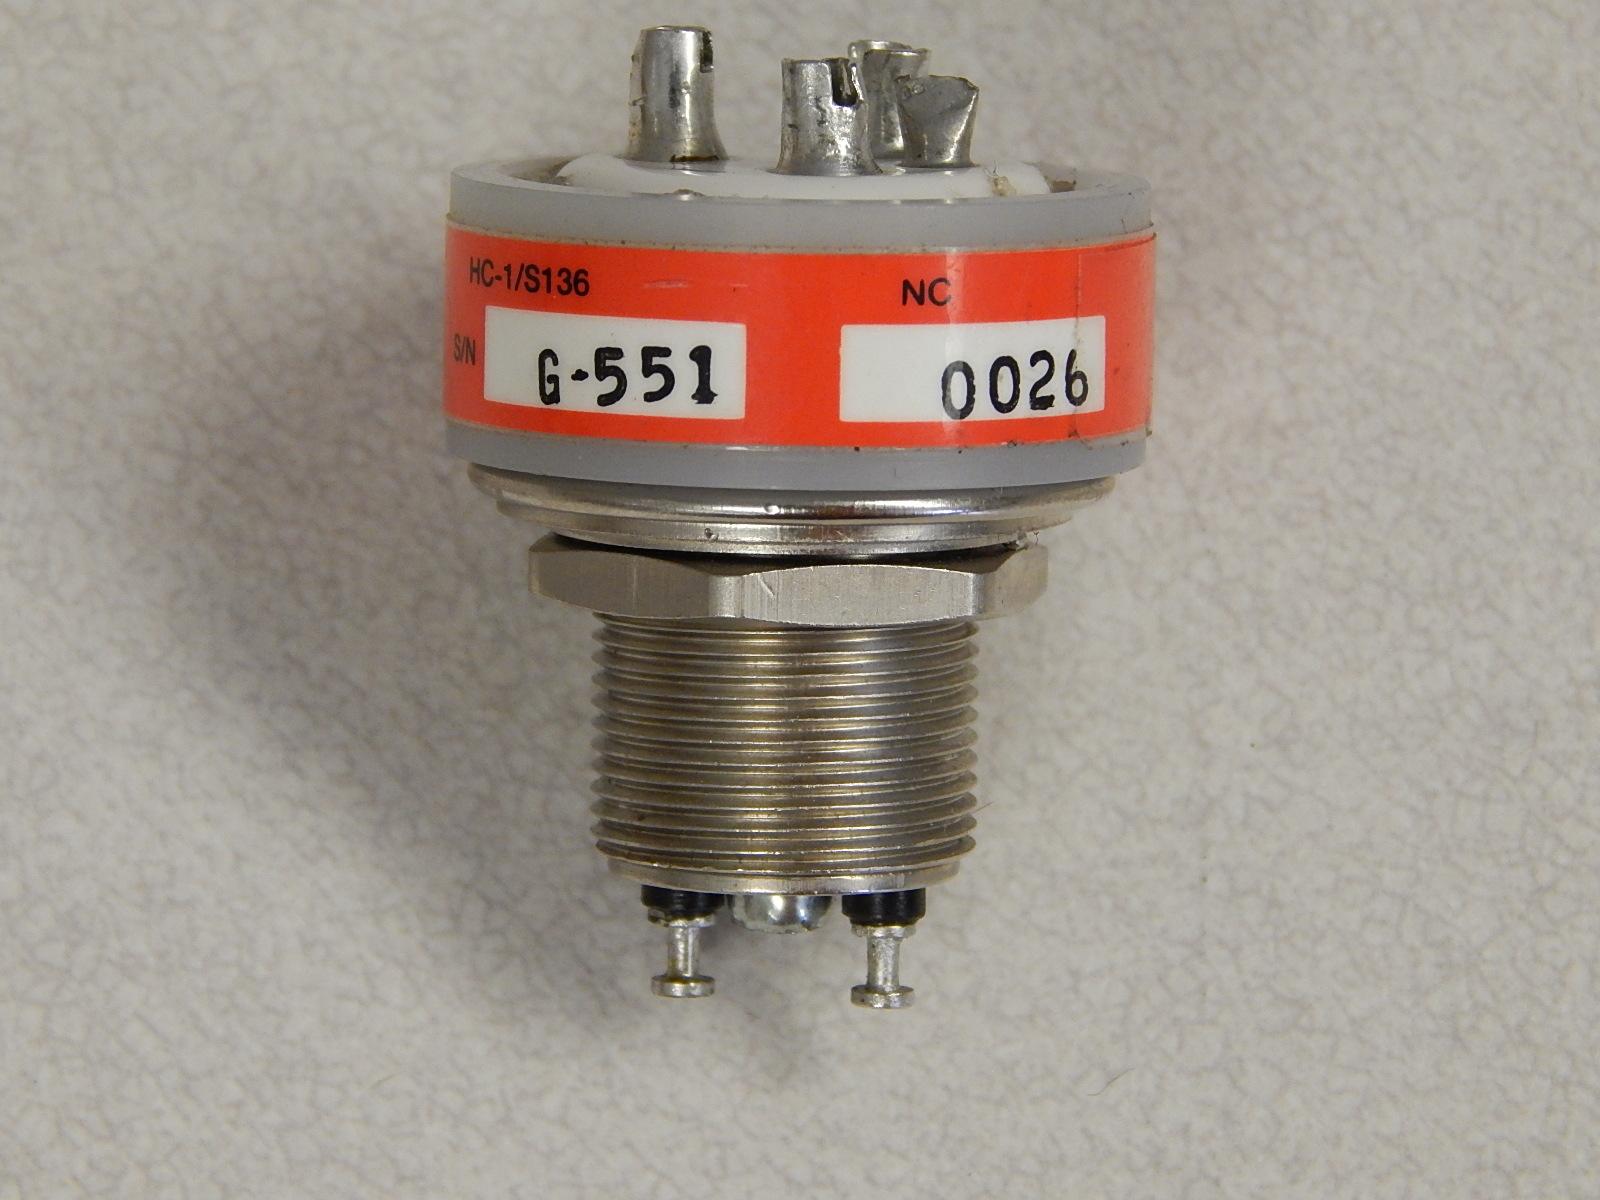 KILOVAC HIGH VOLTAGE RELAY HC-1/S135